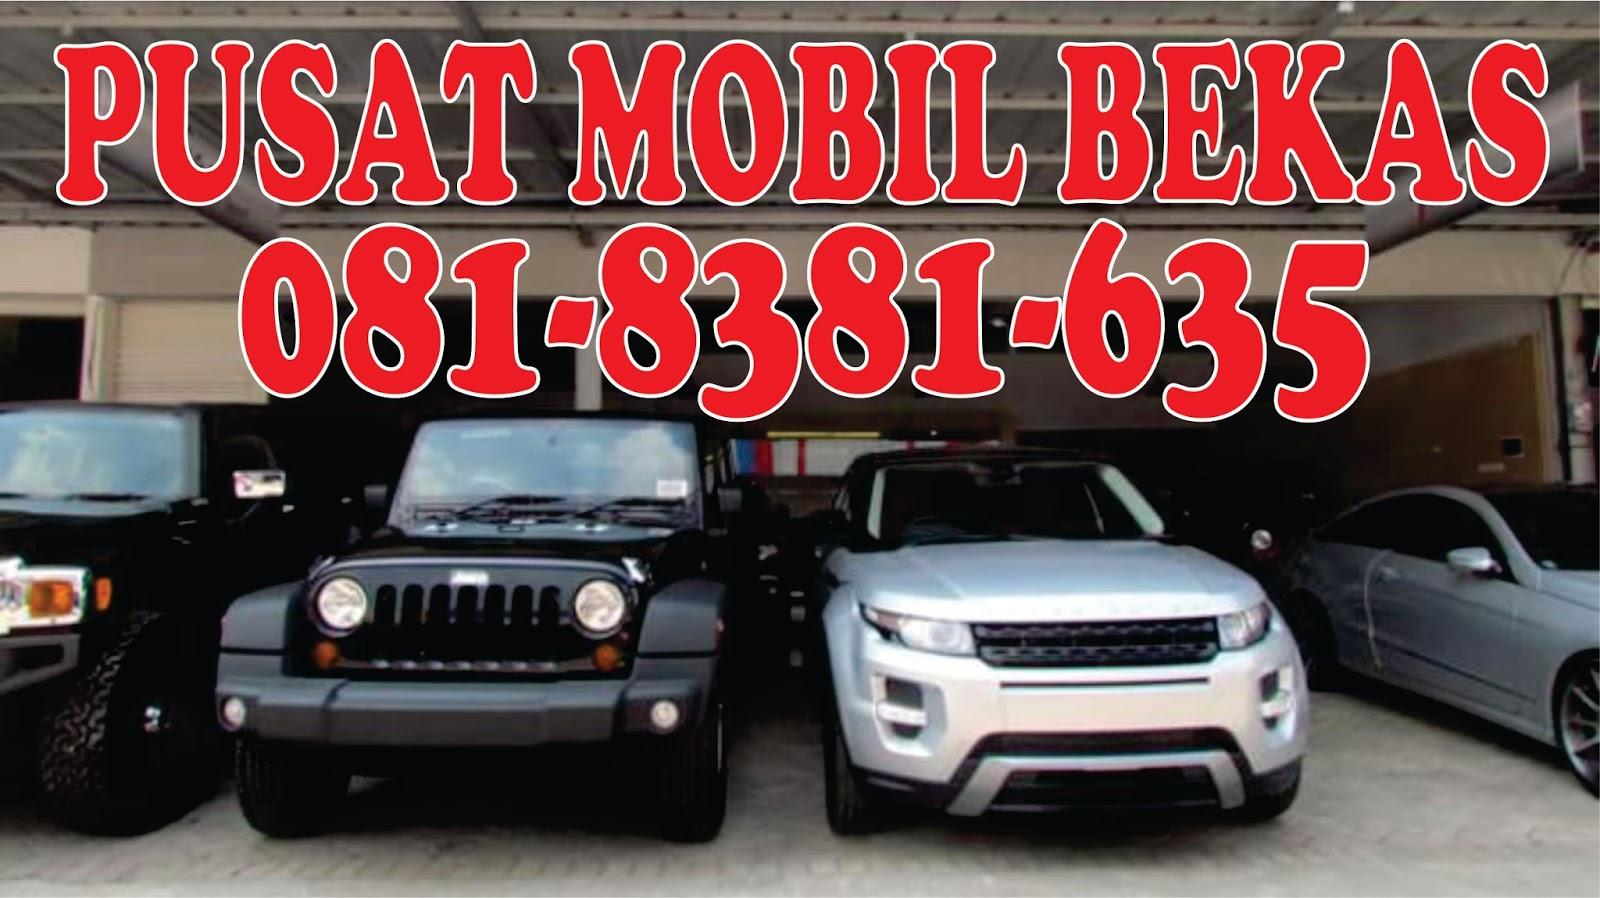 Mobil Bekas Sidoarjo 081 8381 635 Xl Mobil Bekas Di Surabaya